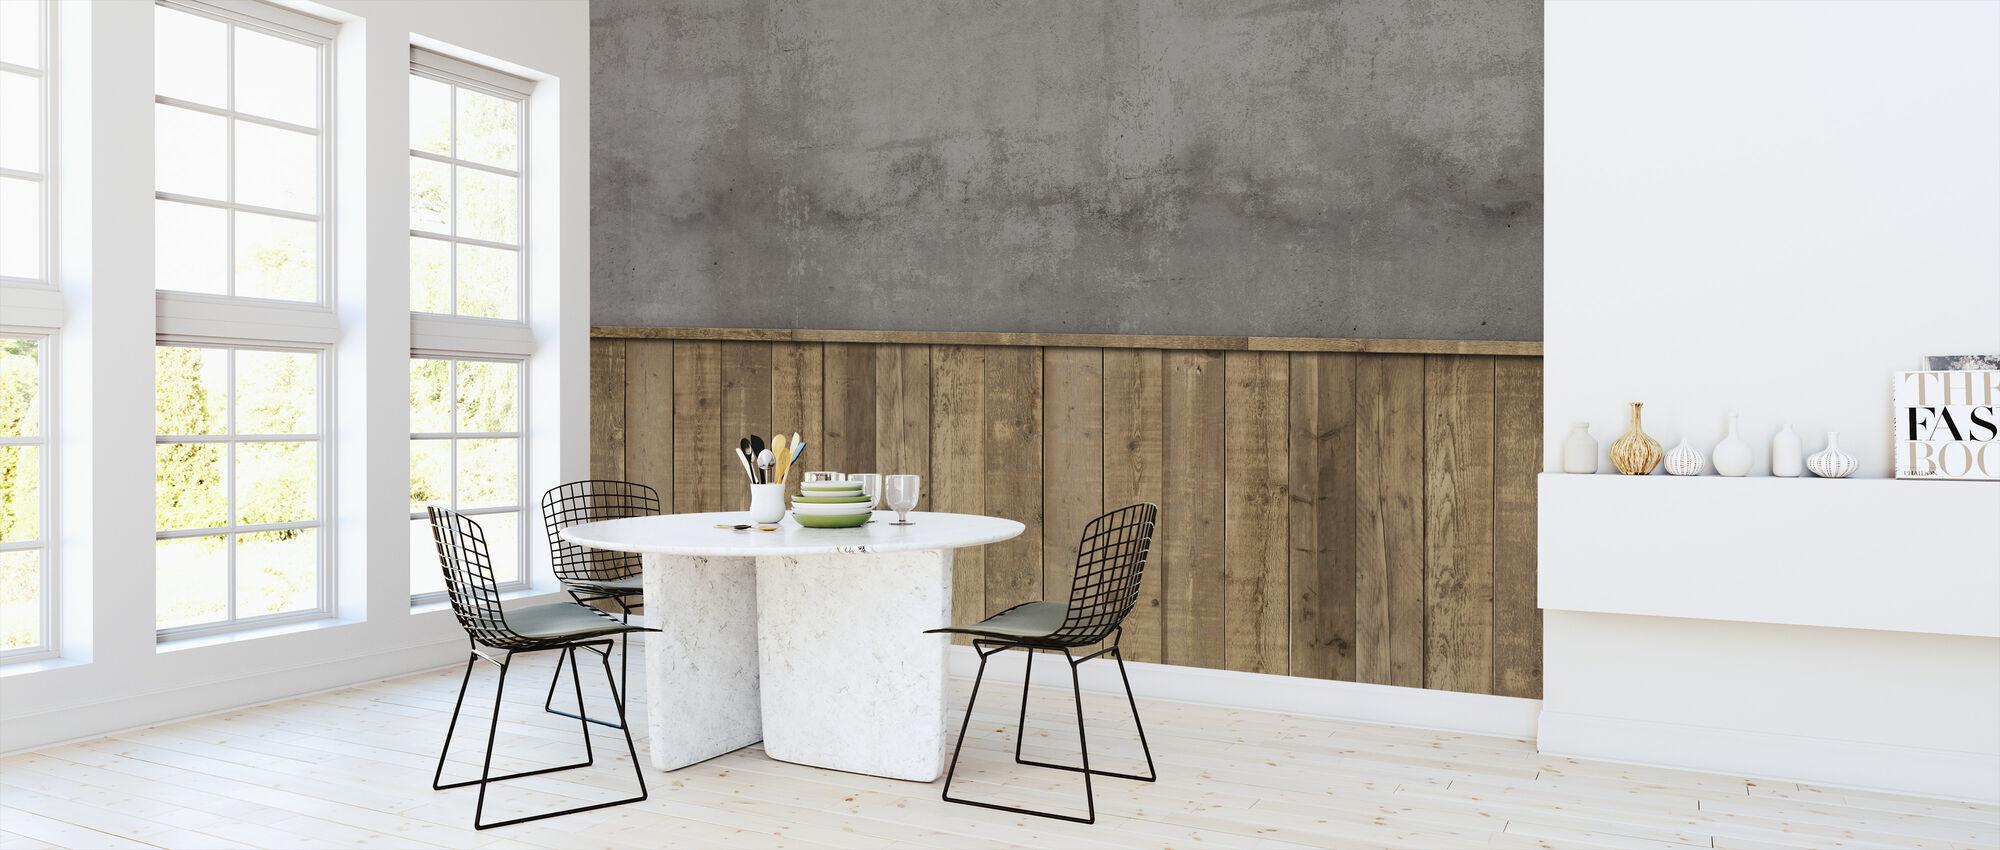 Rough Store Wall - Wallpaper - Kitchen